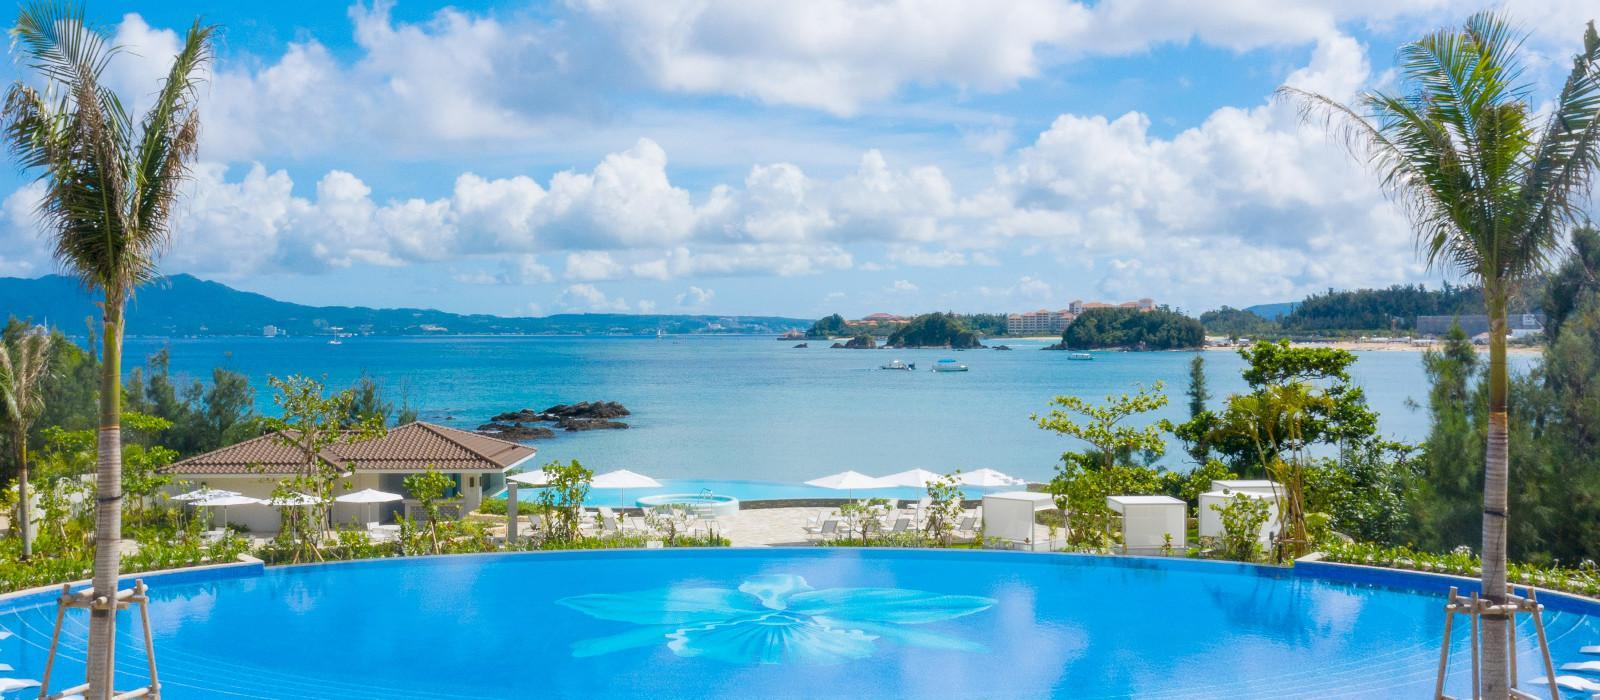 沖繩海麗客蘭尼酒店(Halekulani Okinawa)【 沖繩,日本】 酒店  www.yisecj.live